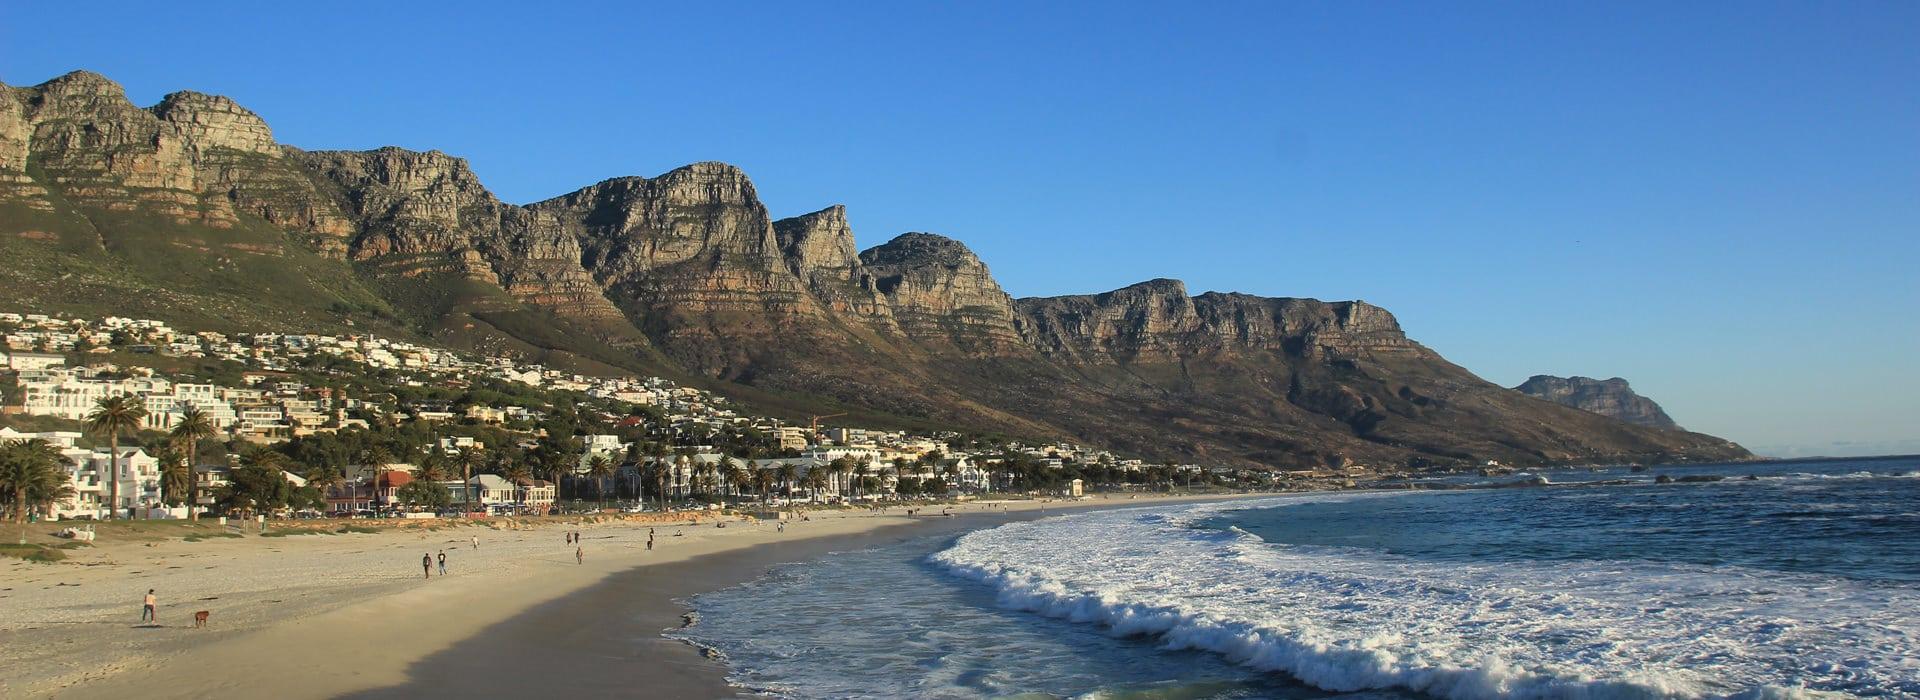 Südafrika Reisen zu den 12 Apostles in Kapstadt